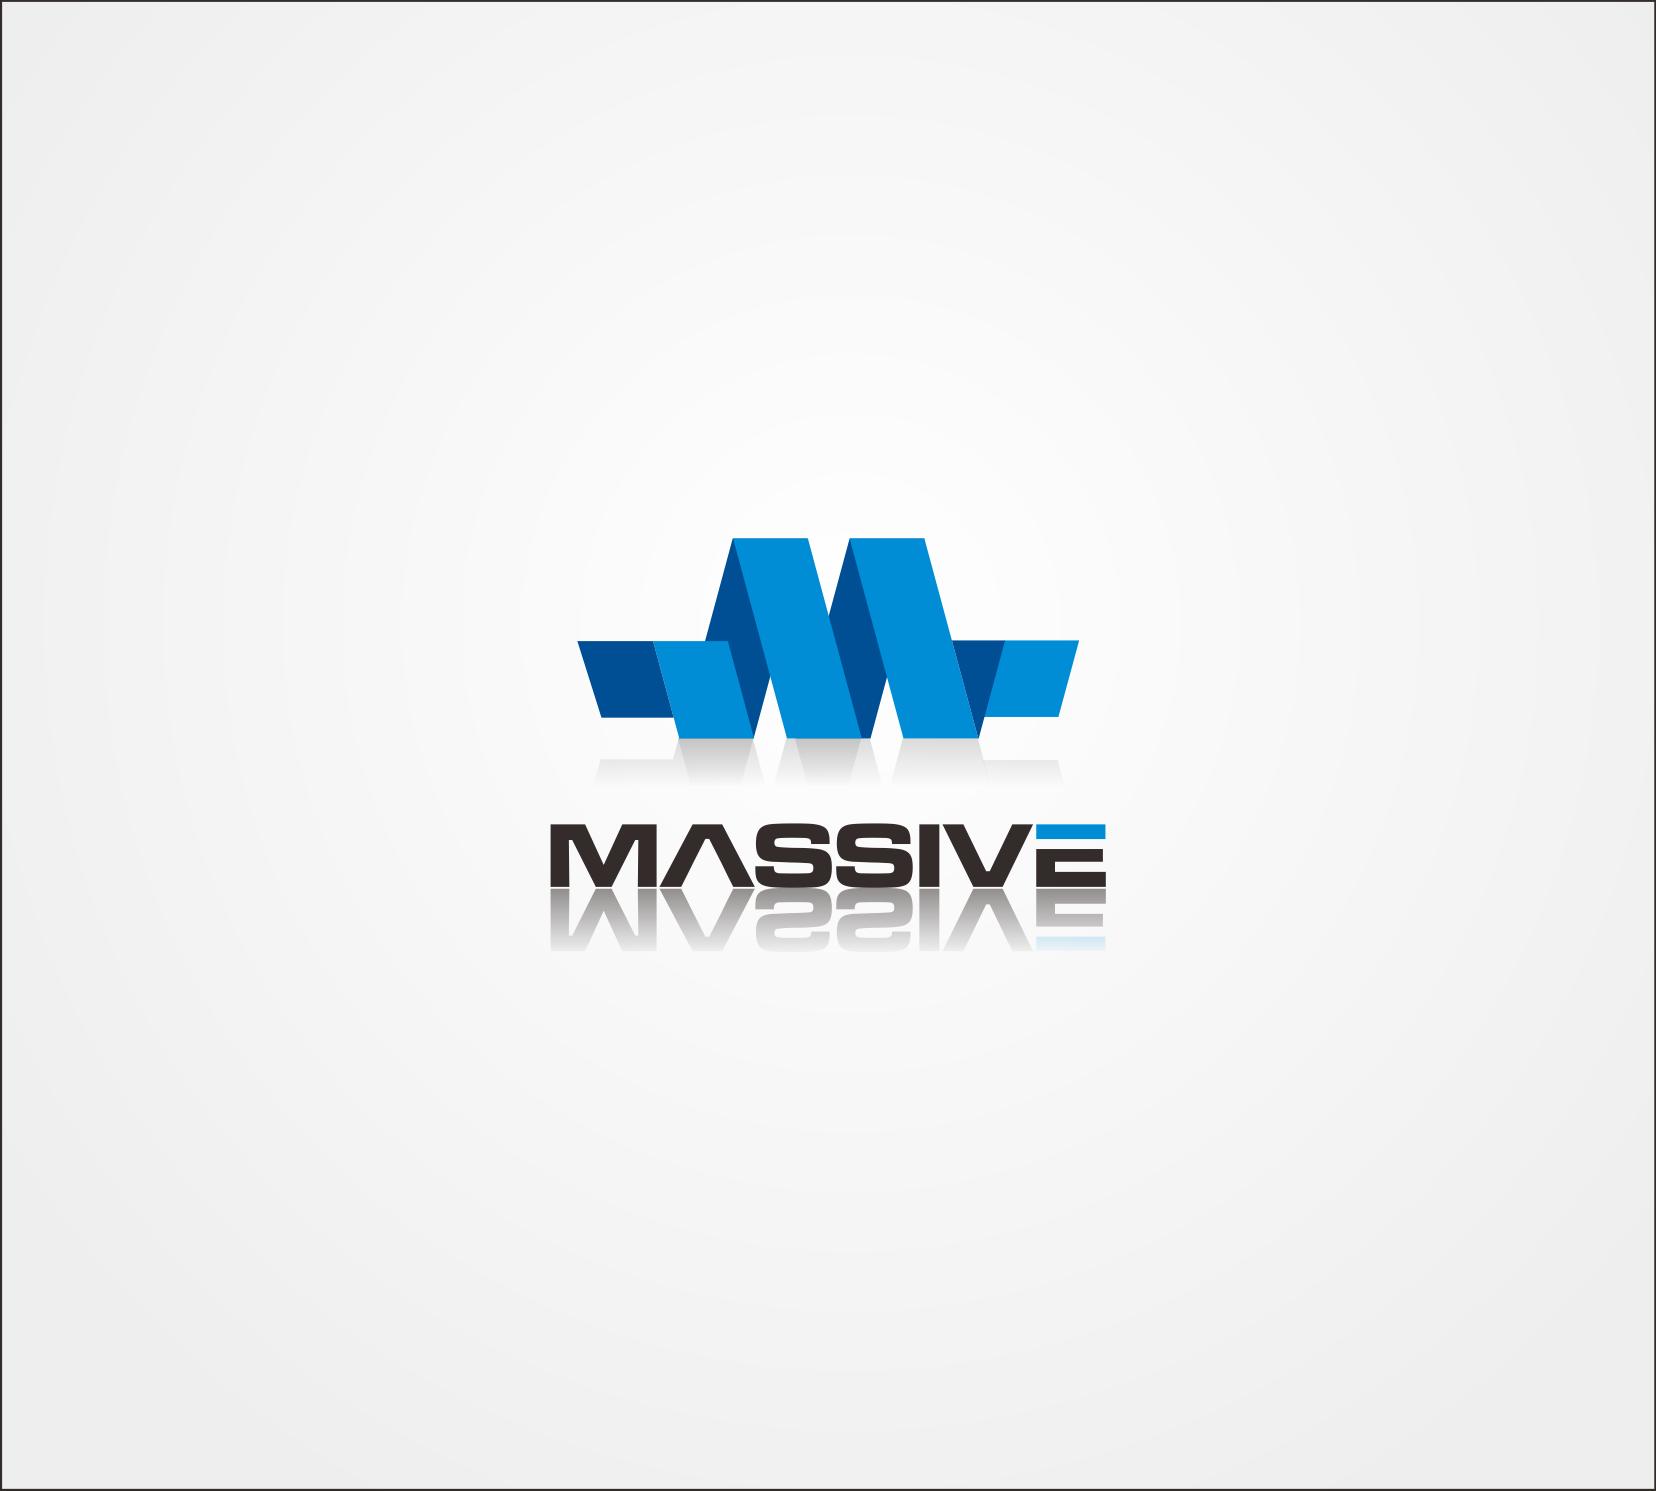 Logo Design by Red Zone - Entry No. 495 in the Logo Design Contest MASSIVE LOGO.